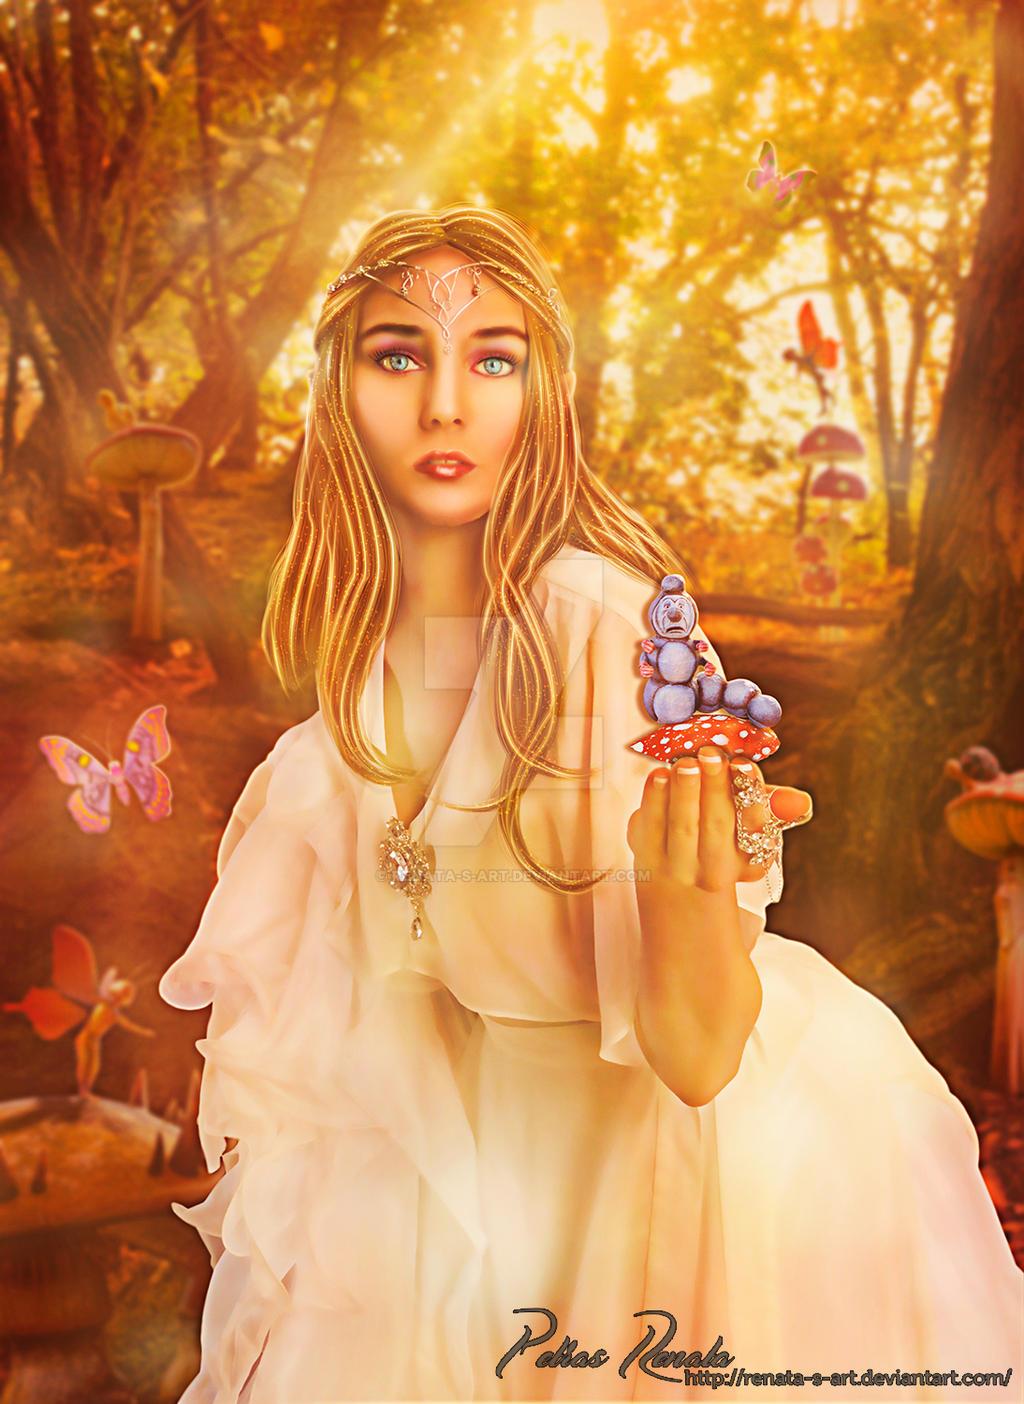 Picking Mushrooms by Renata-s-art